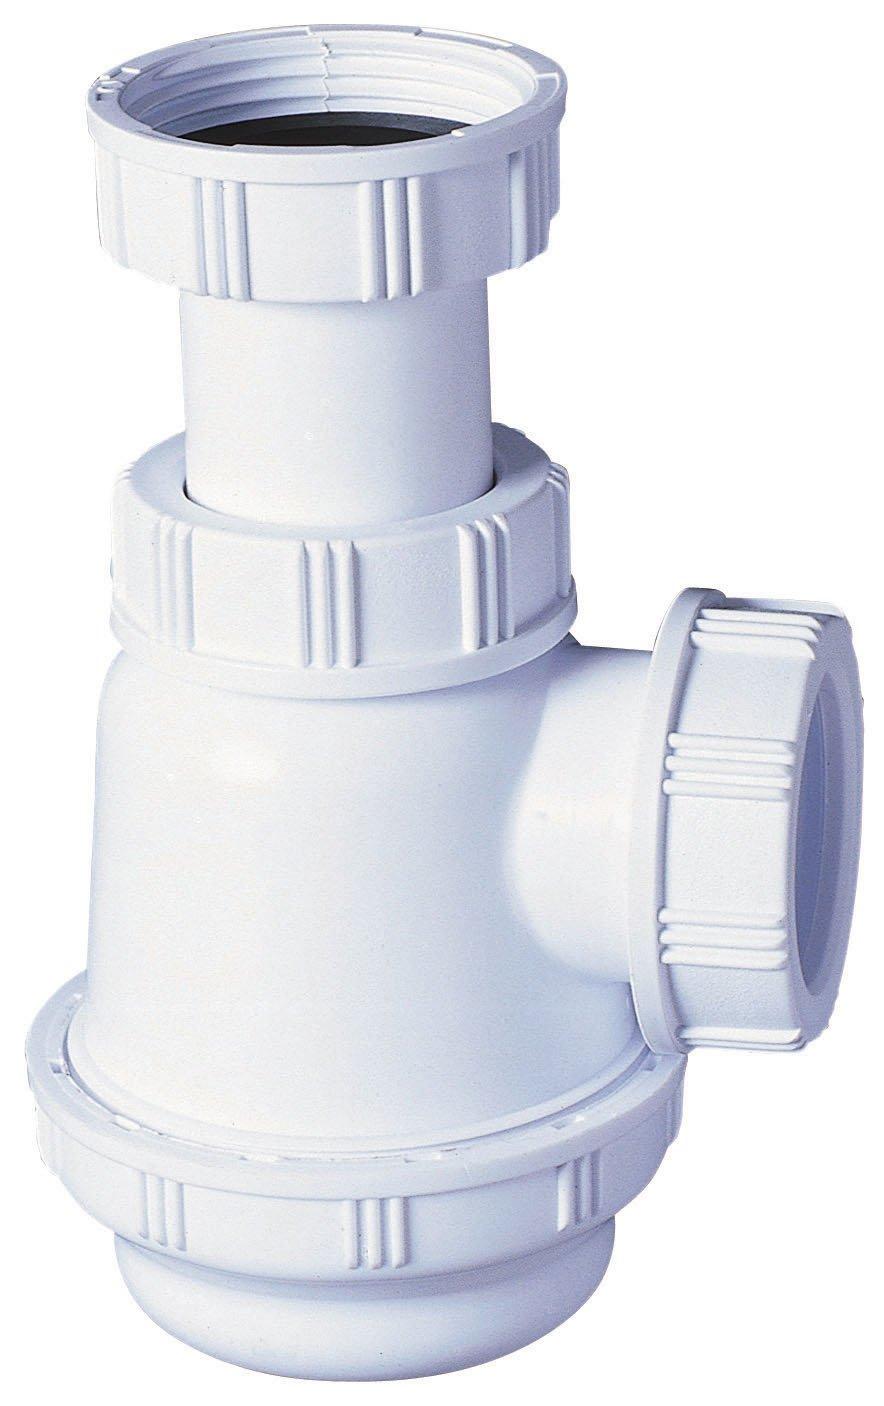 Wirquin SP3178 - Sifon botella pequeno 1.1/4' diá metro 32mm